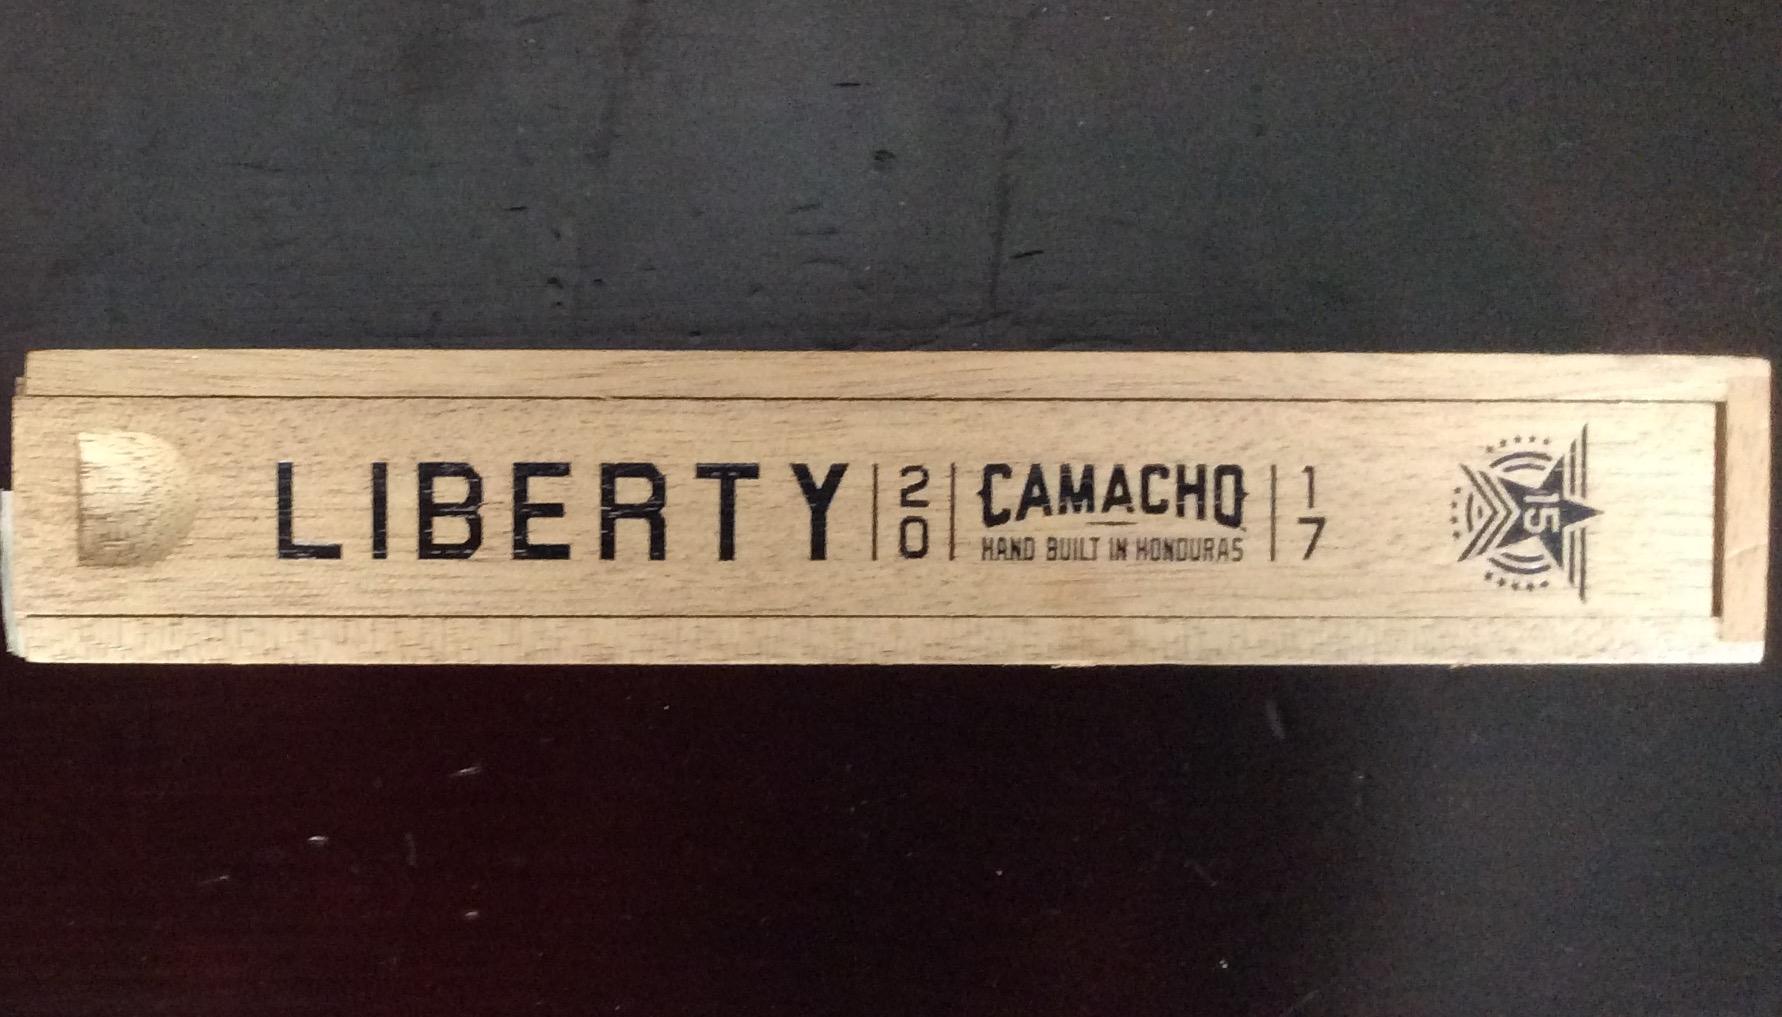 Camacho Liberty 2017 Coffin